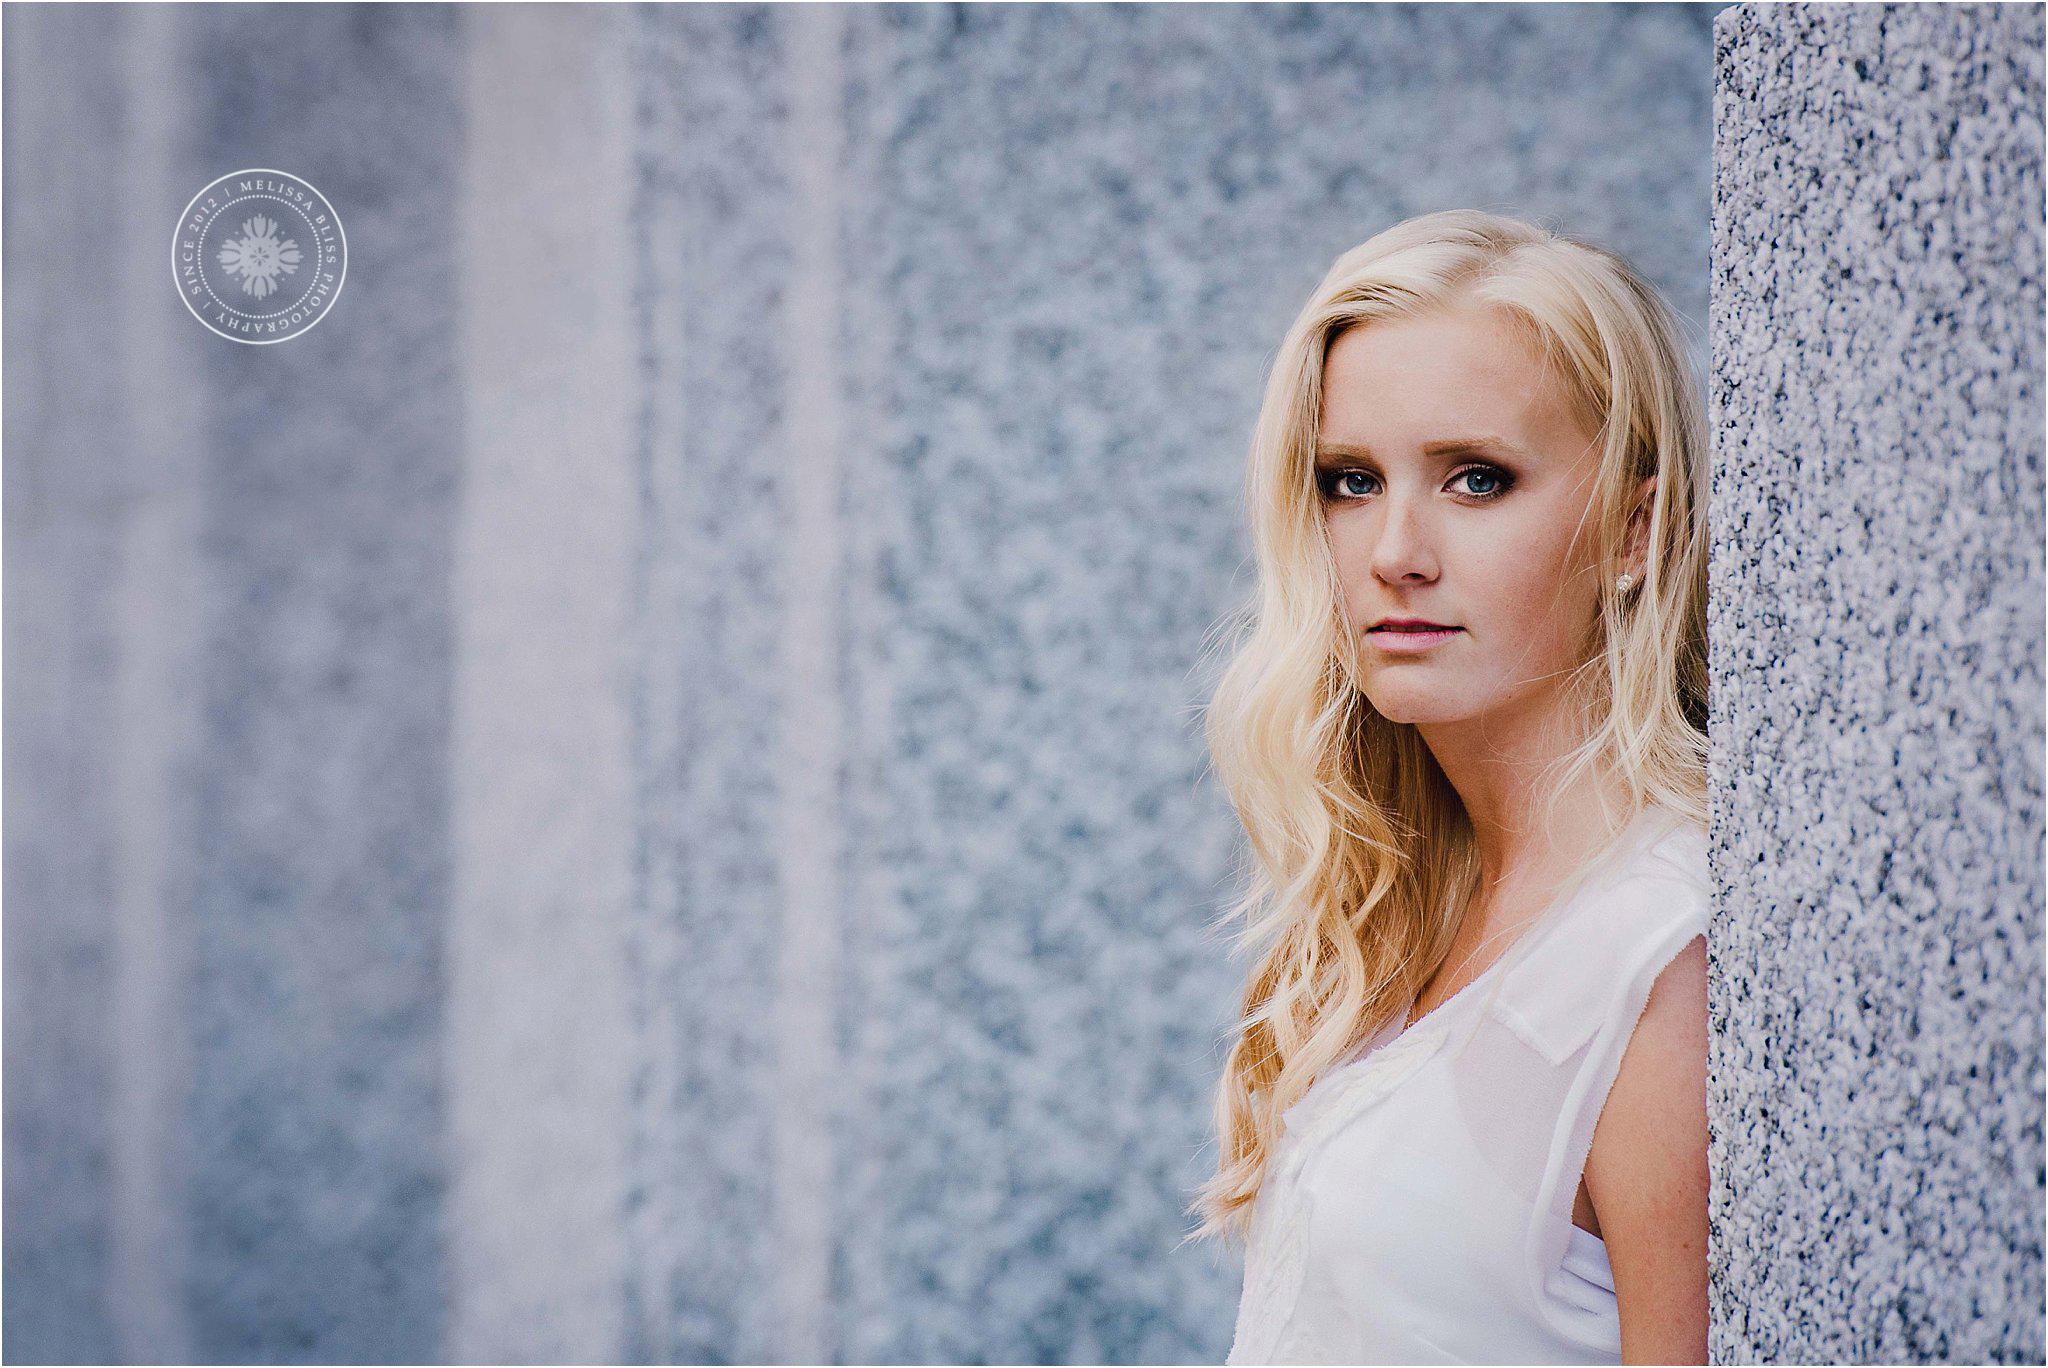 norfolk-va-fine-art-photographer-melissa-bliss-photography-senior-portrait-session-norfolk-arts-district